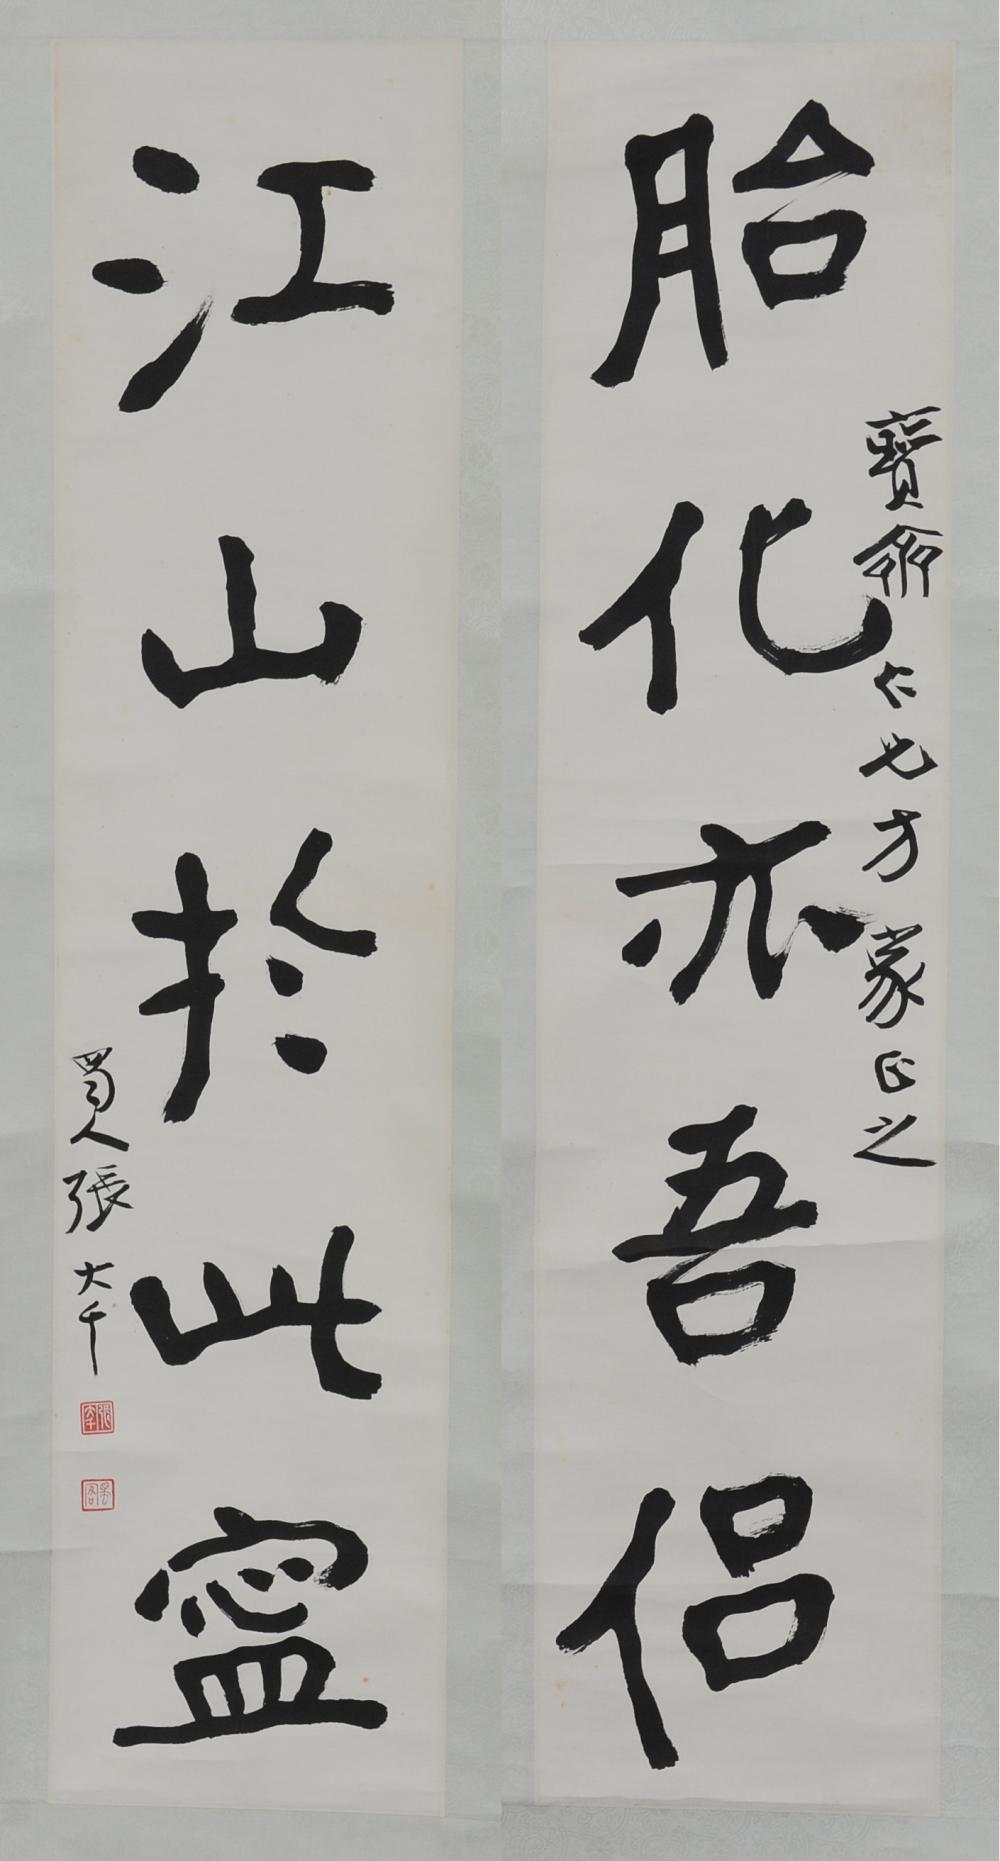 5-CHARACTER CALLIGRAPHY COUPLET, ZHANG DAQIAN